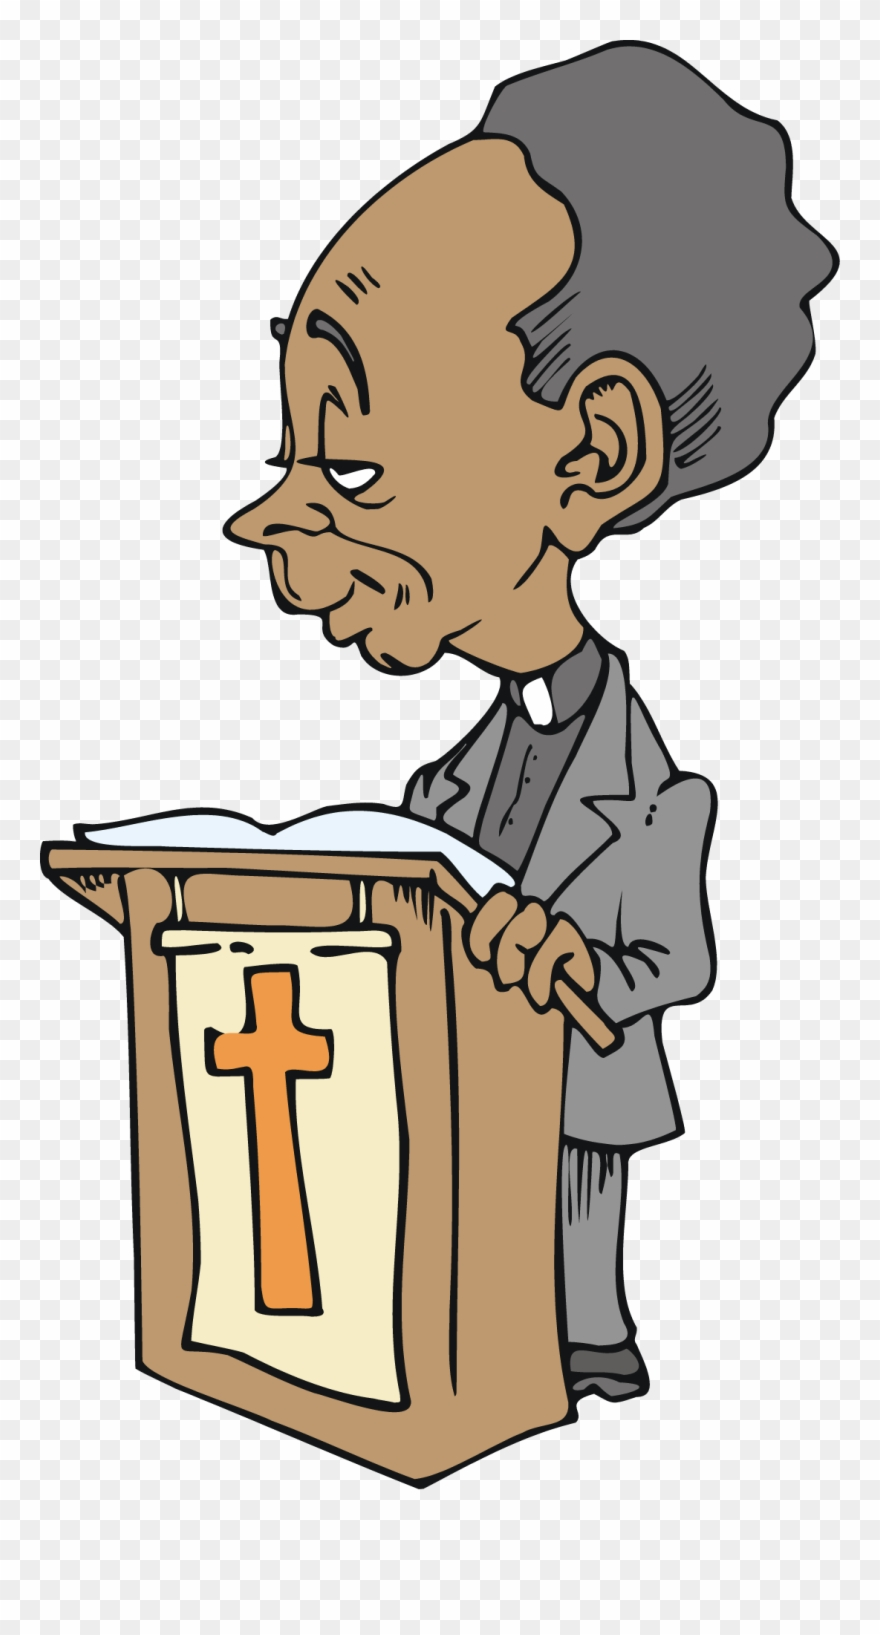 medium resolution of free african american cartoon character preacher vector clipart